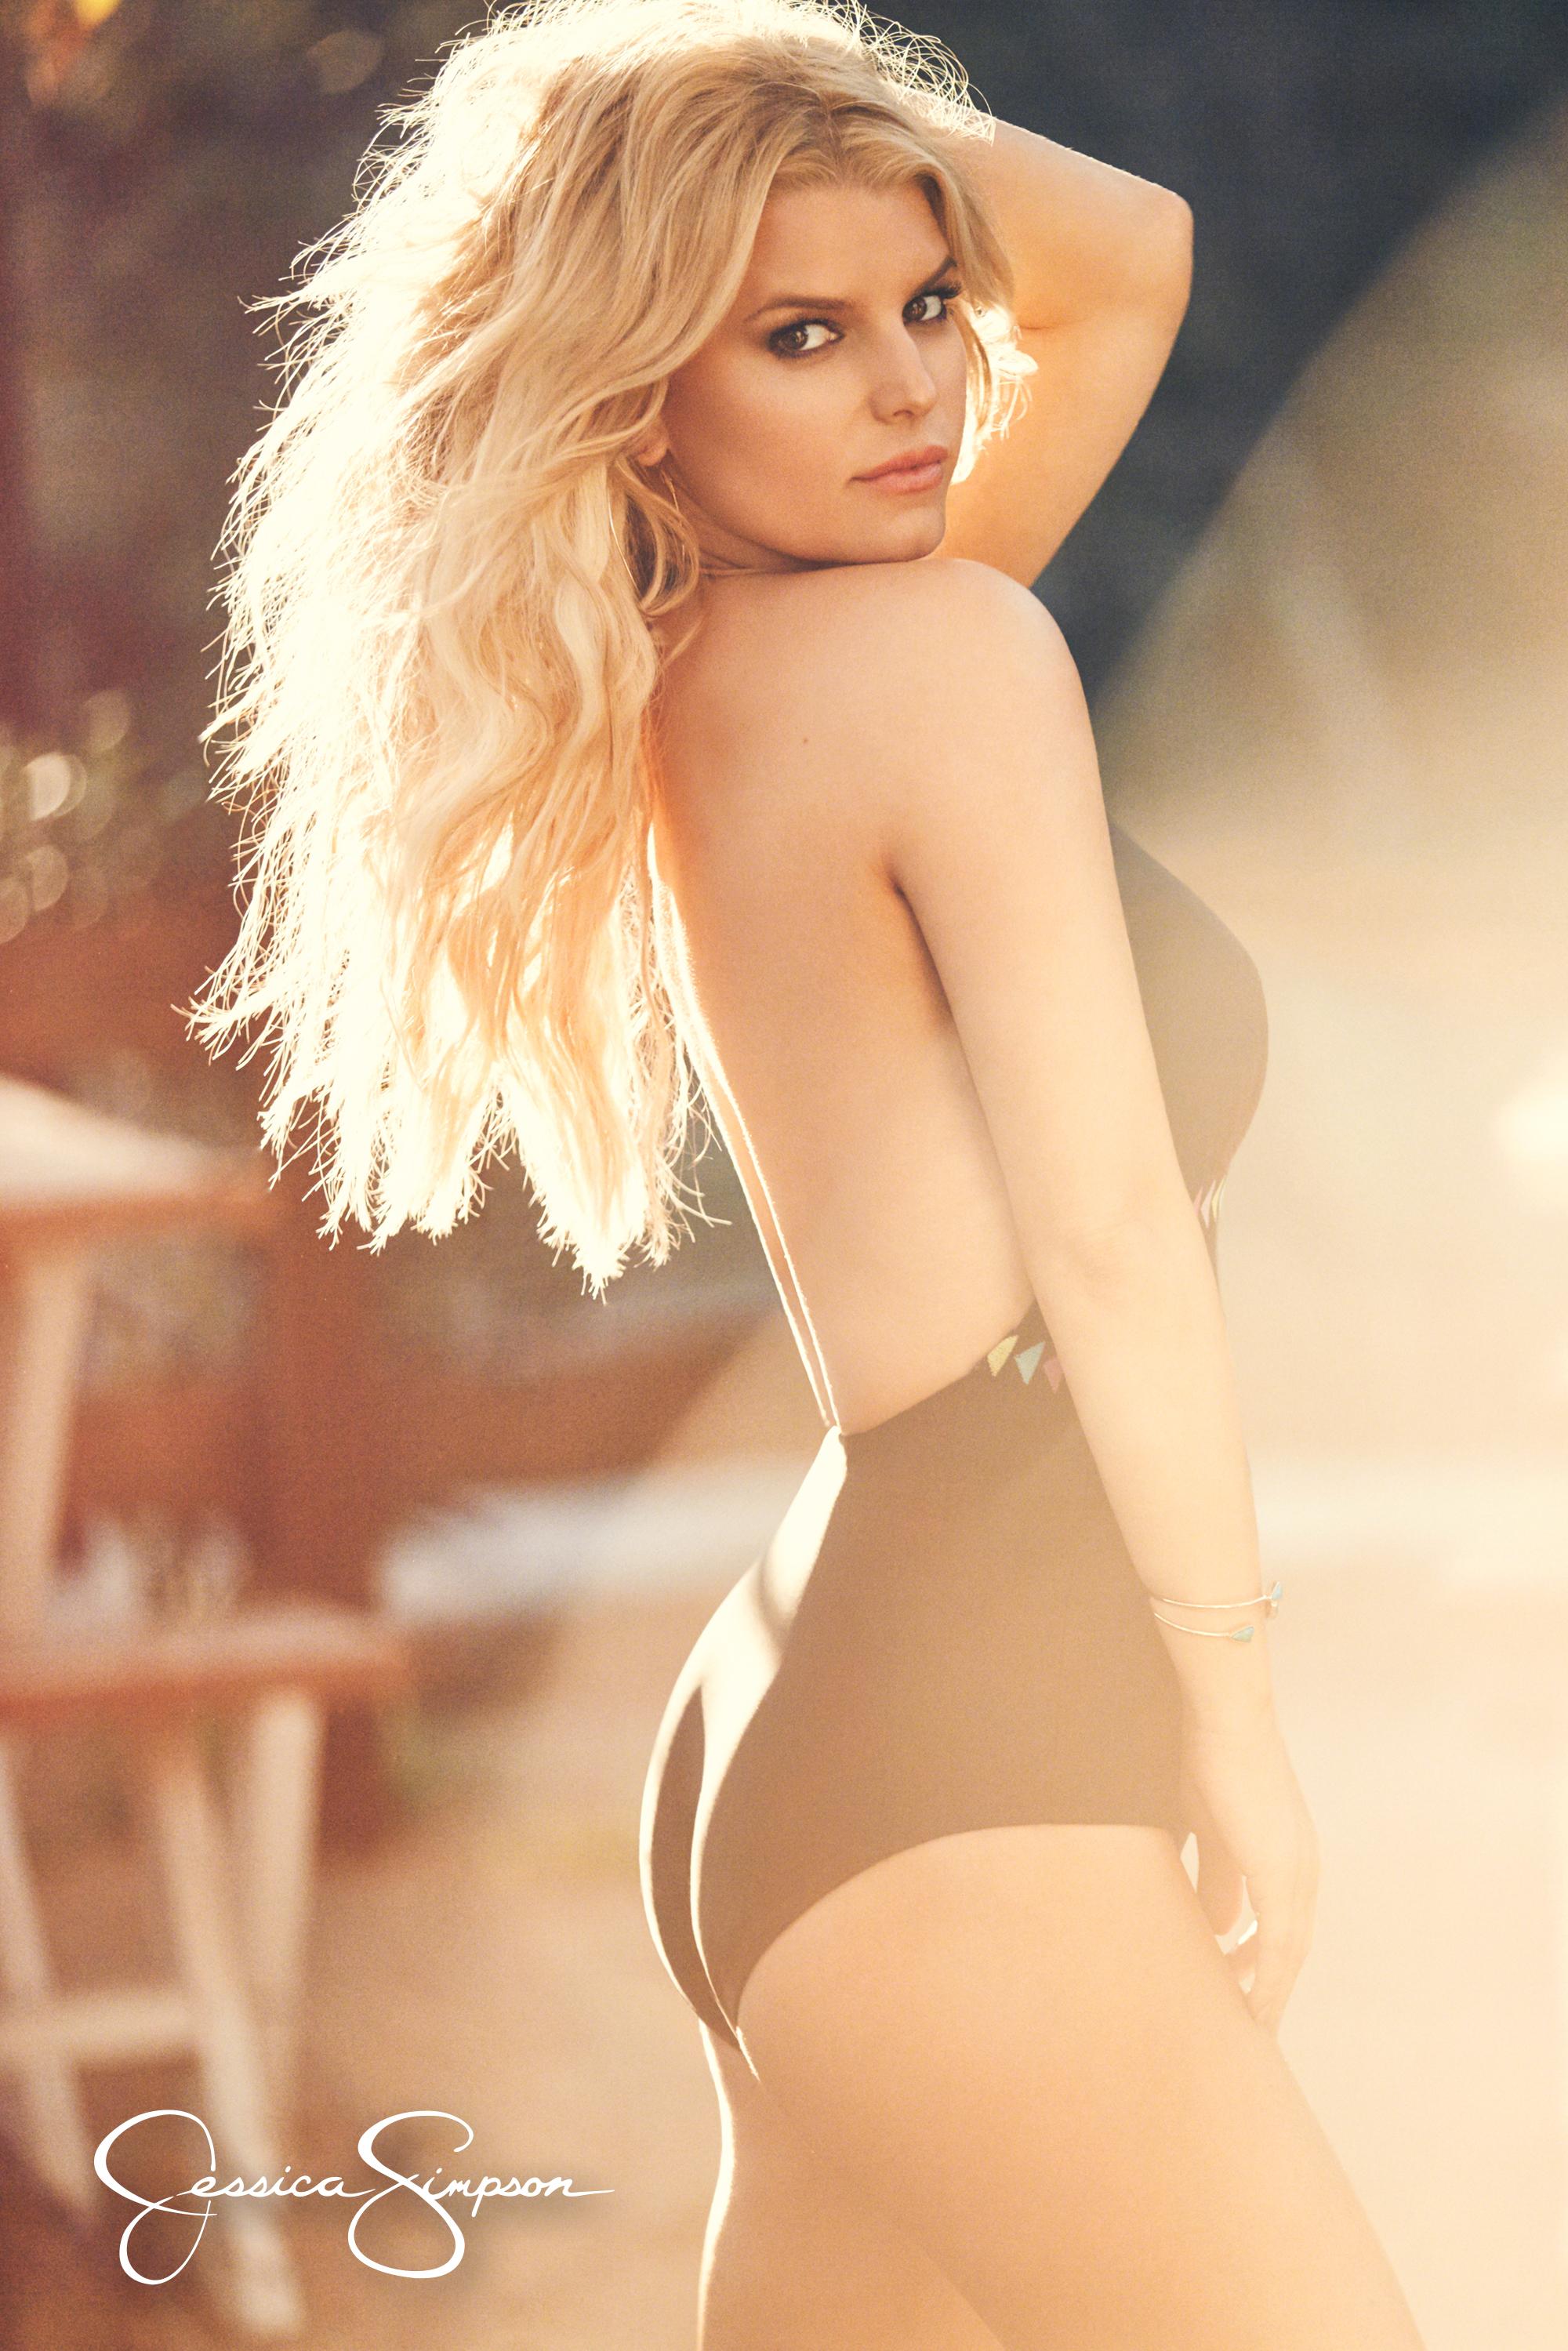 jessica photo simpson bikini in